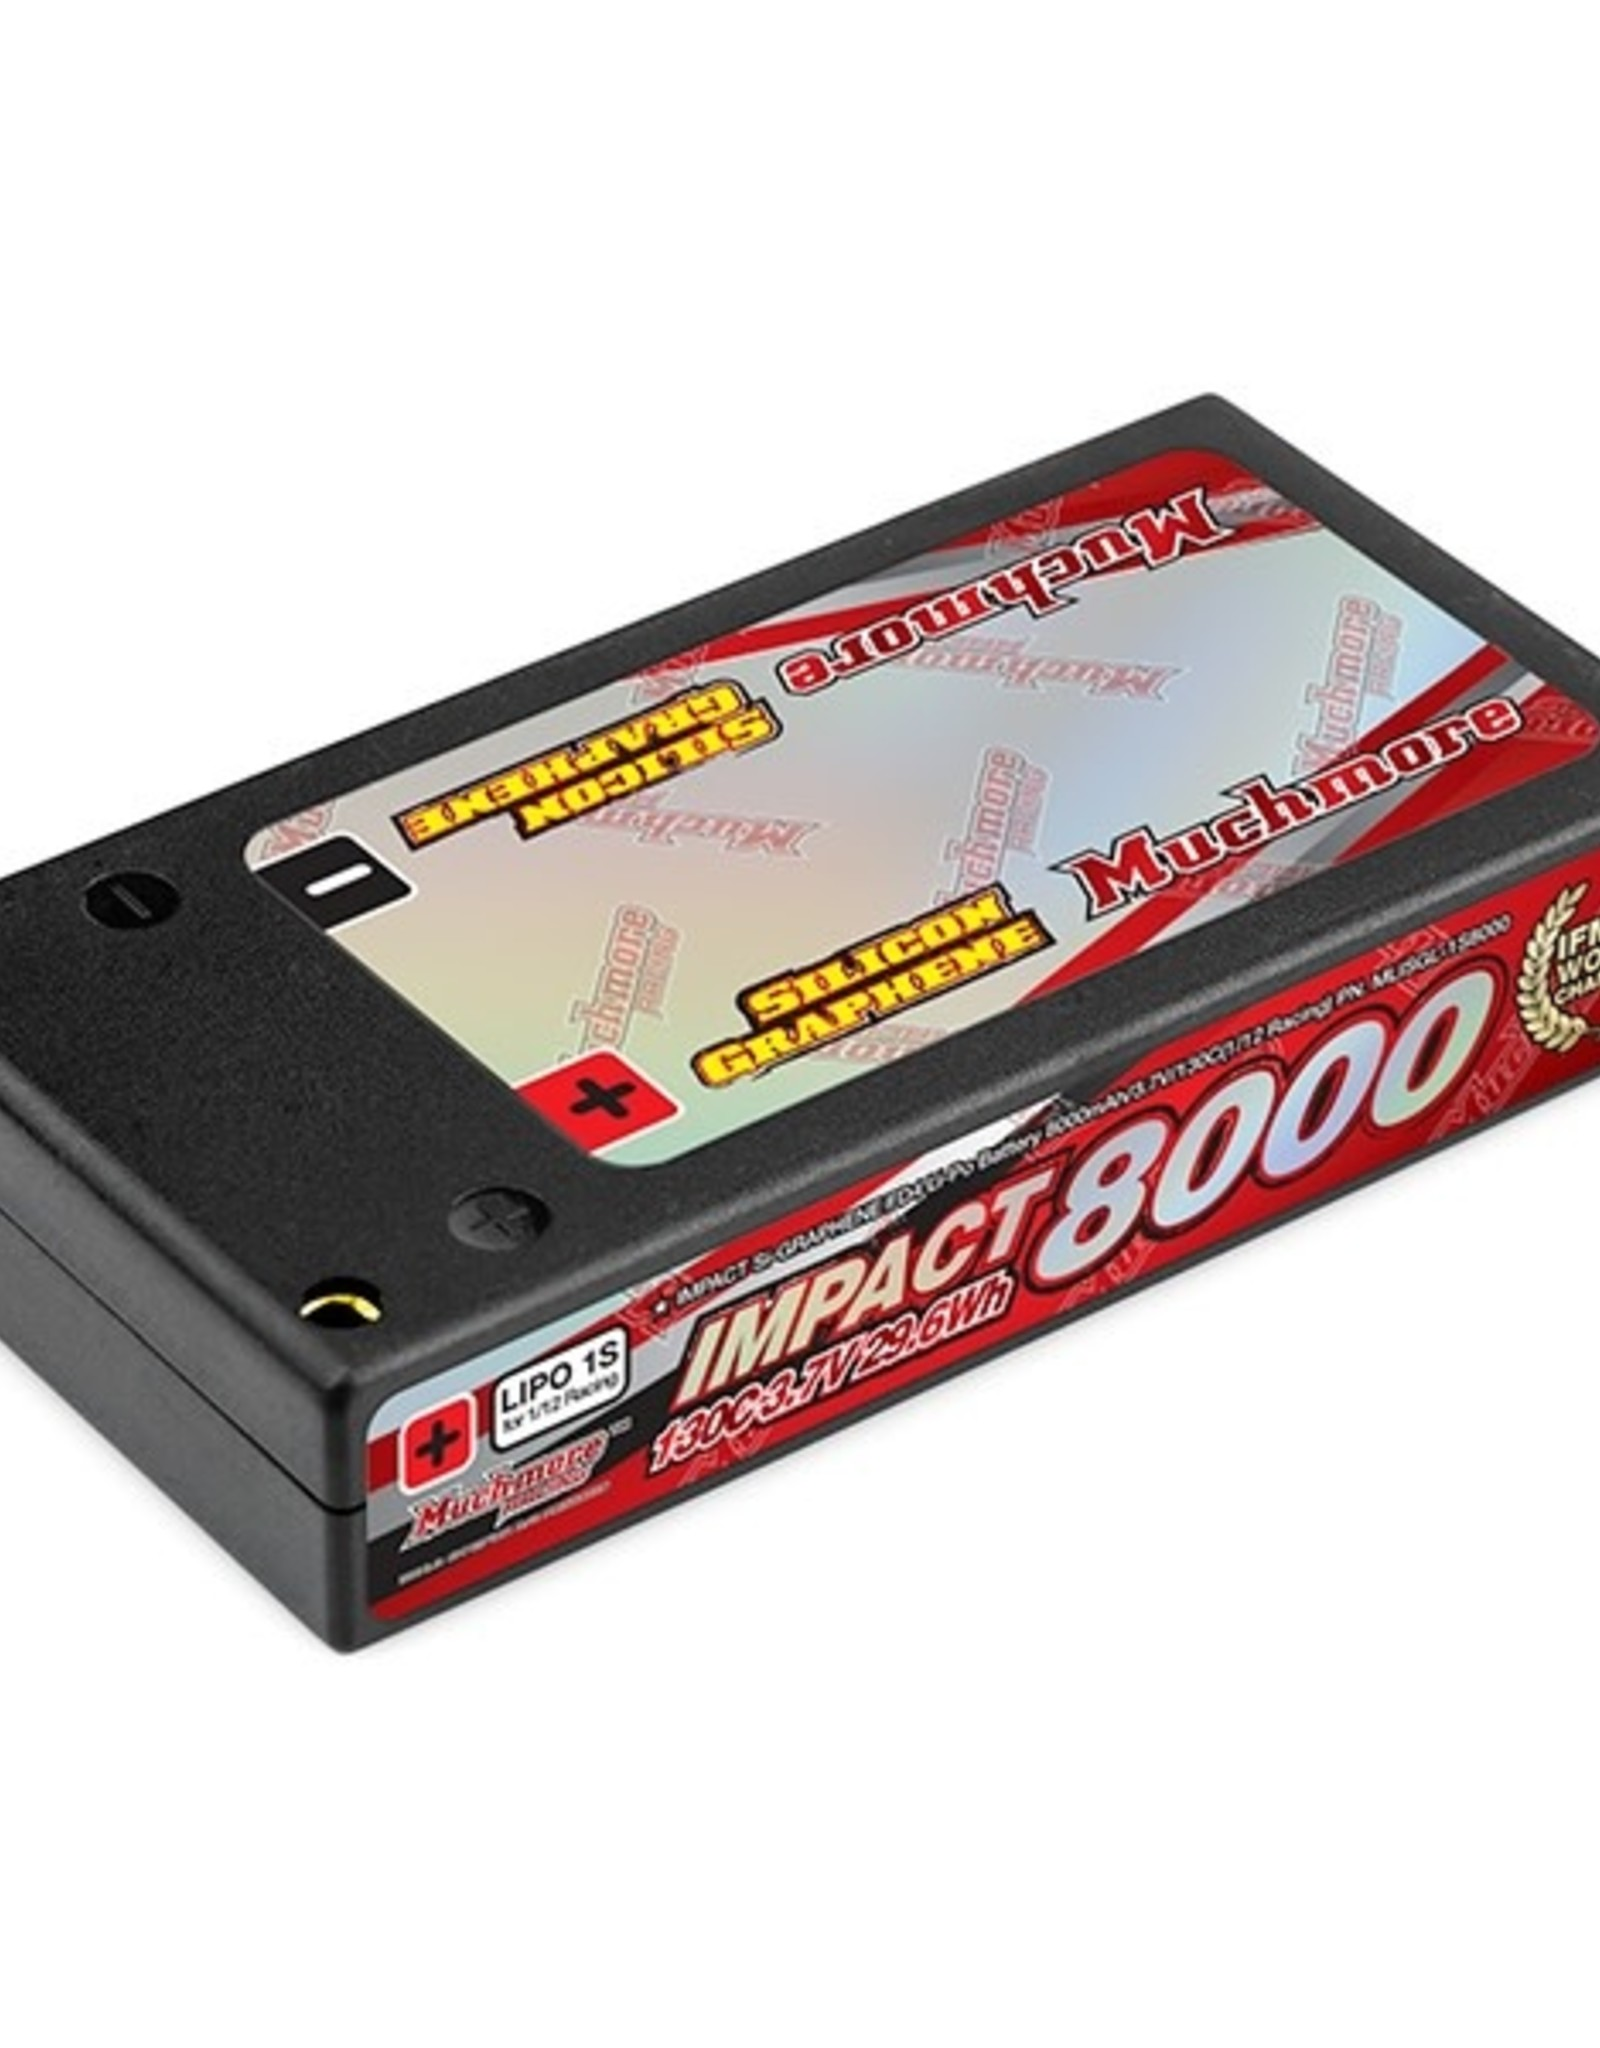 Muchmore IMPACT [Silicon Graphene] FD4 Li-Po Battery 8350mAh/3.7V 130C Hard Case (1/12 Racing)